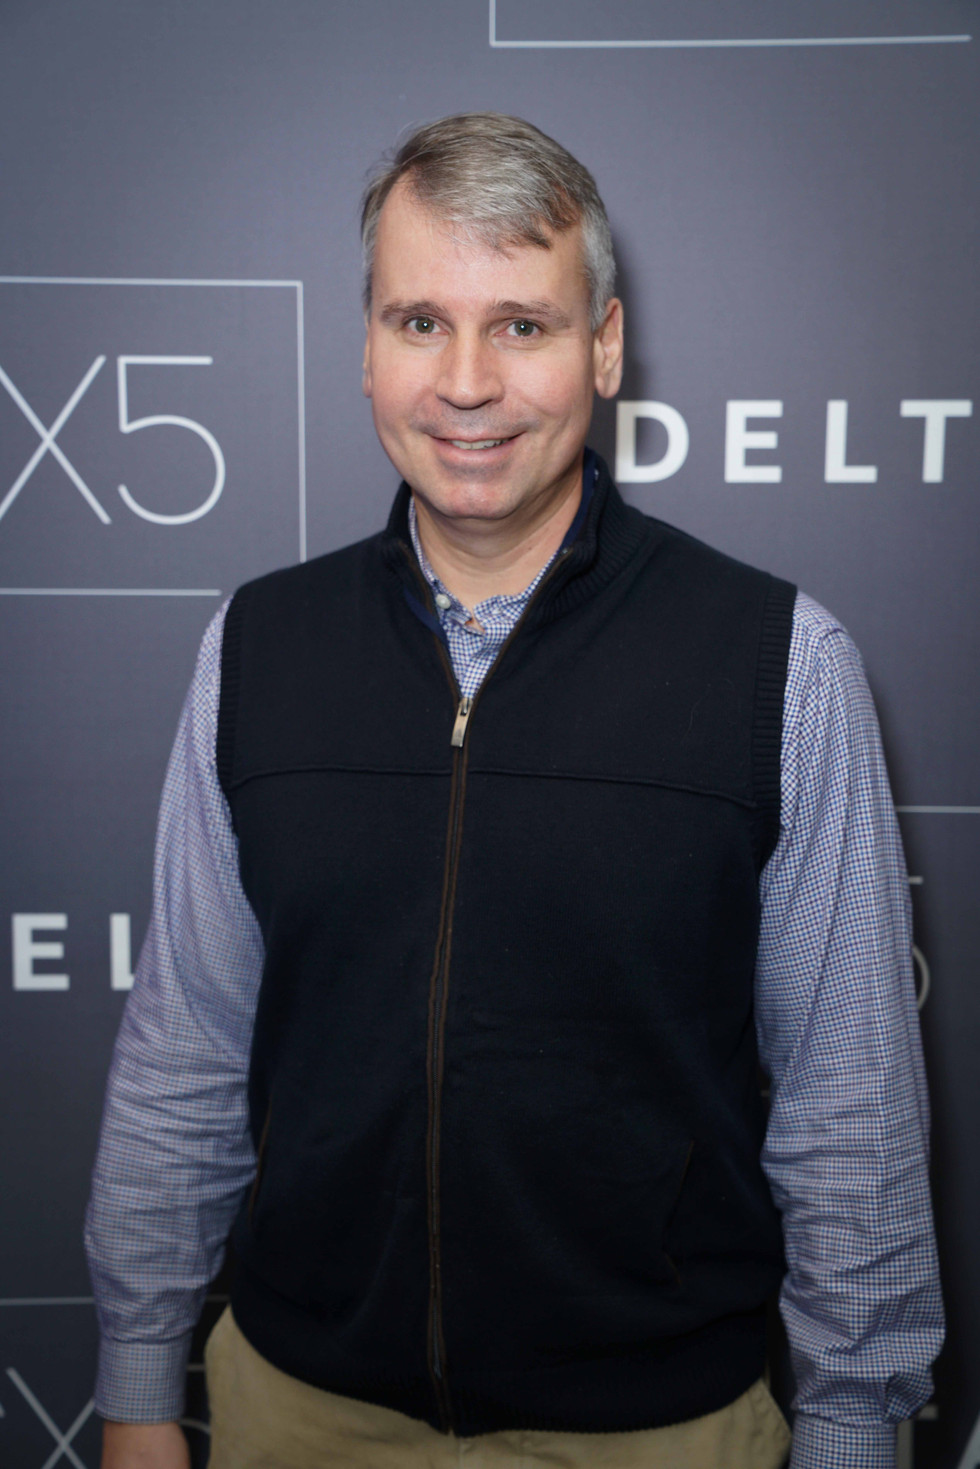 Delta CX5 1-26-18-36